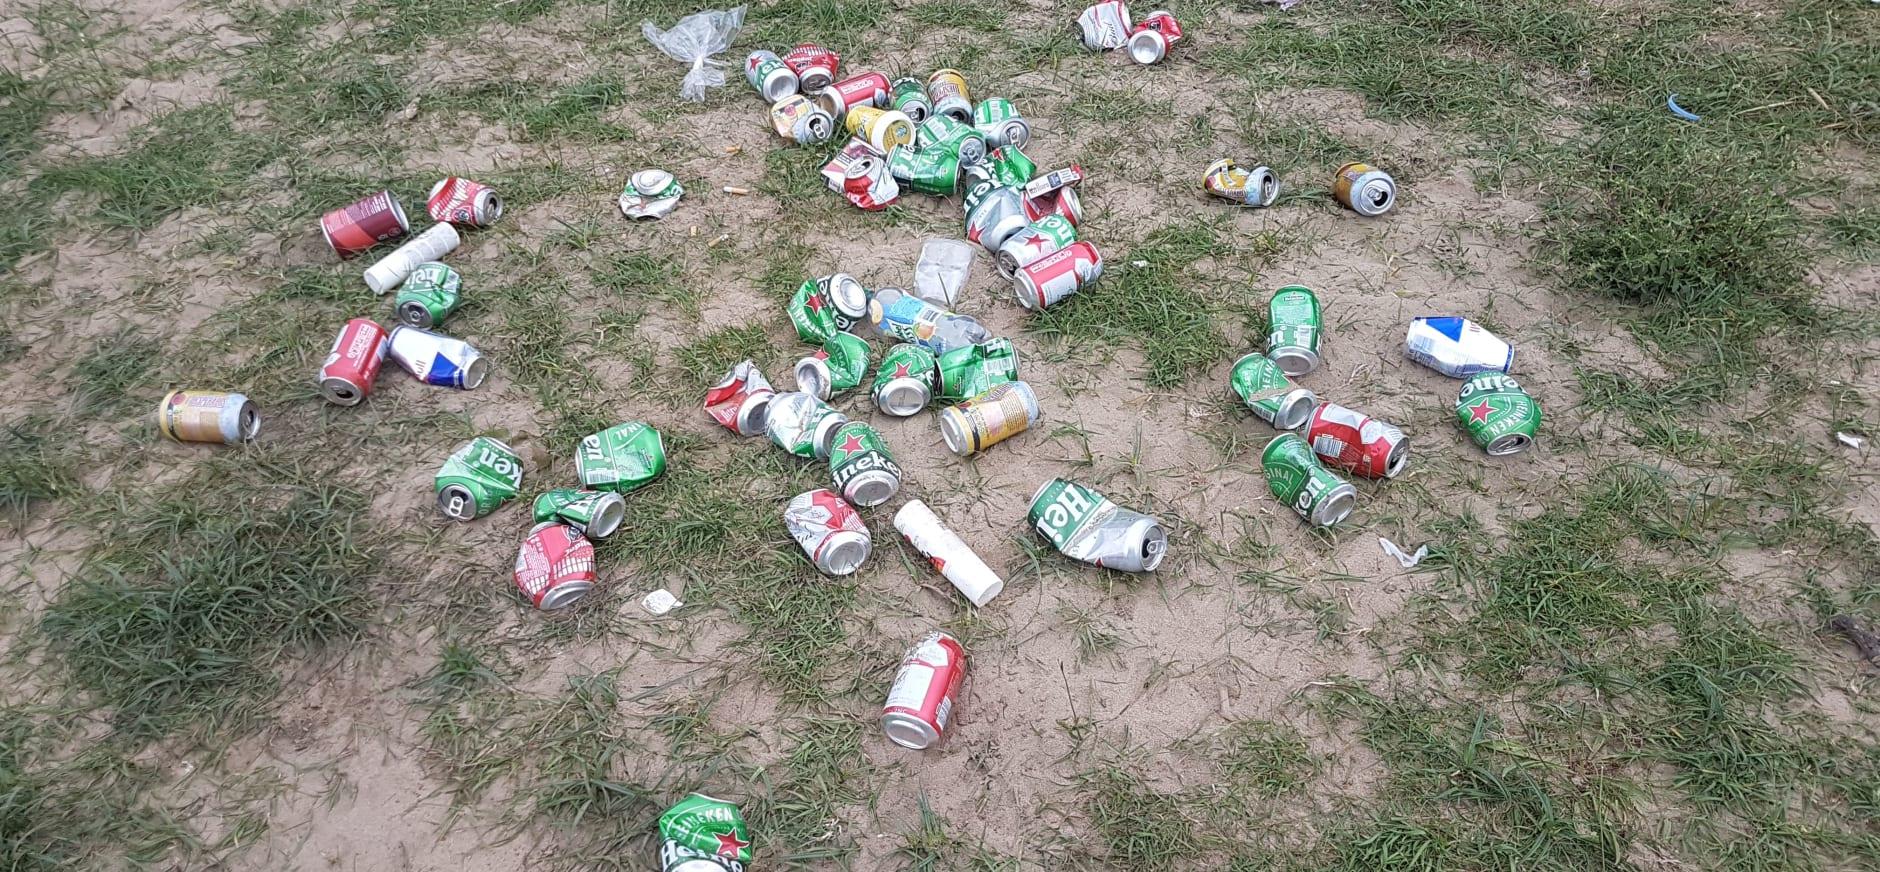 Blikjes afval langs de Maas